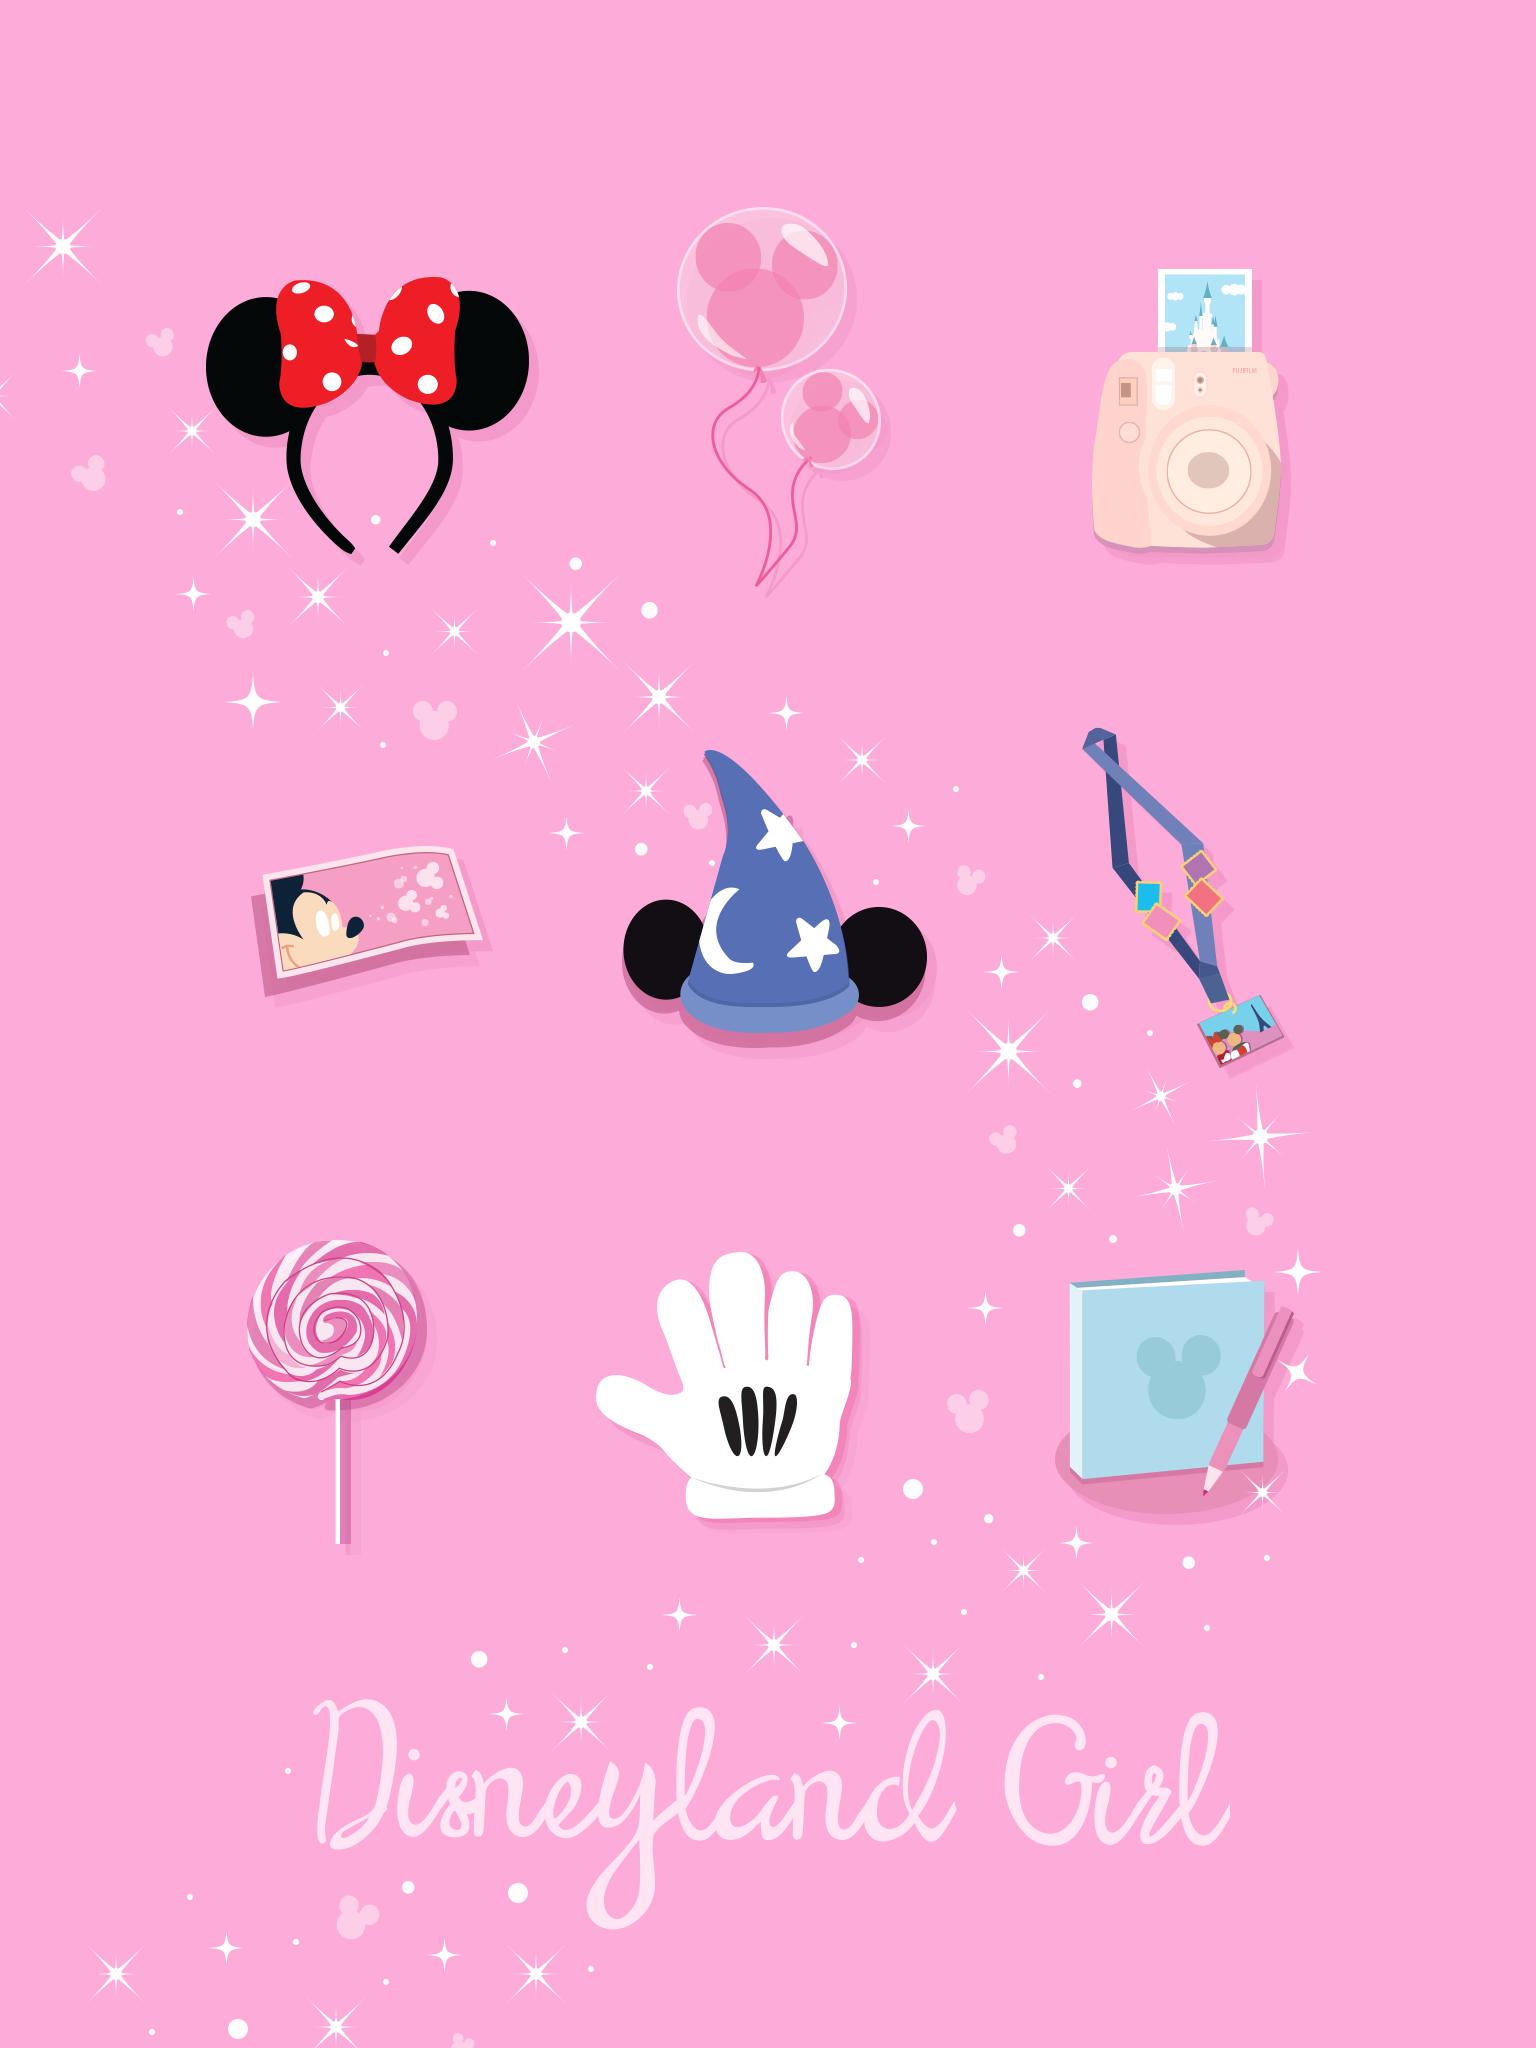 Disney Girl Disneyland Smartphone Ipad Wallpaper